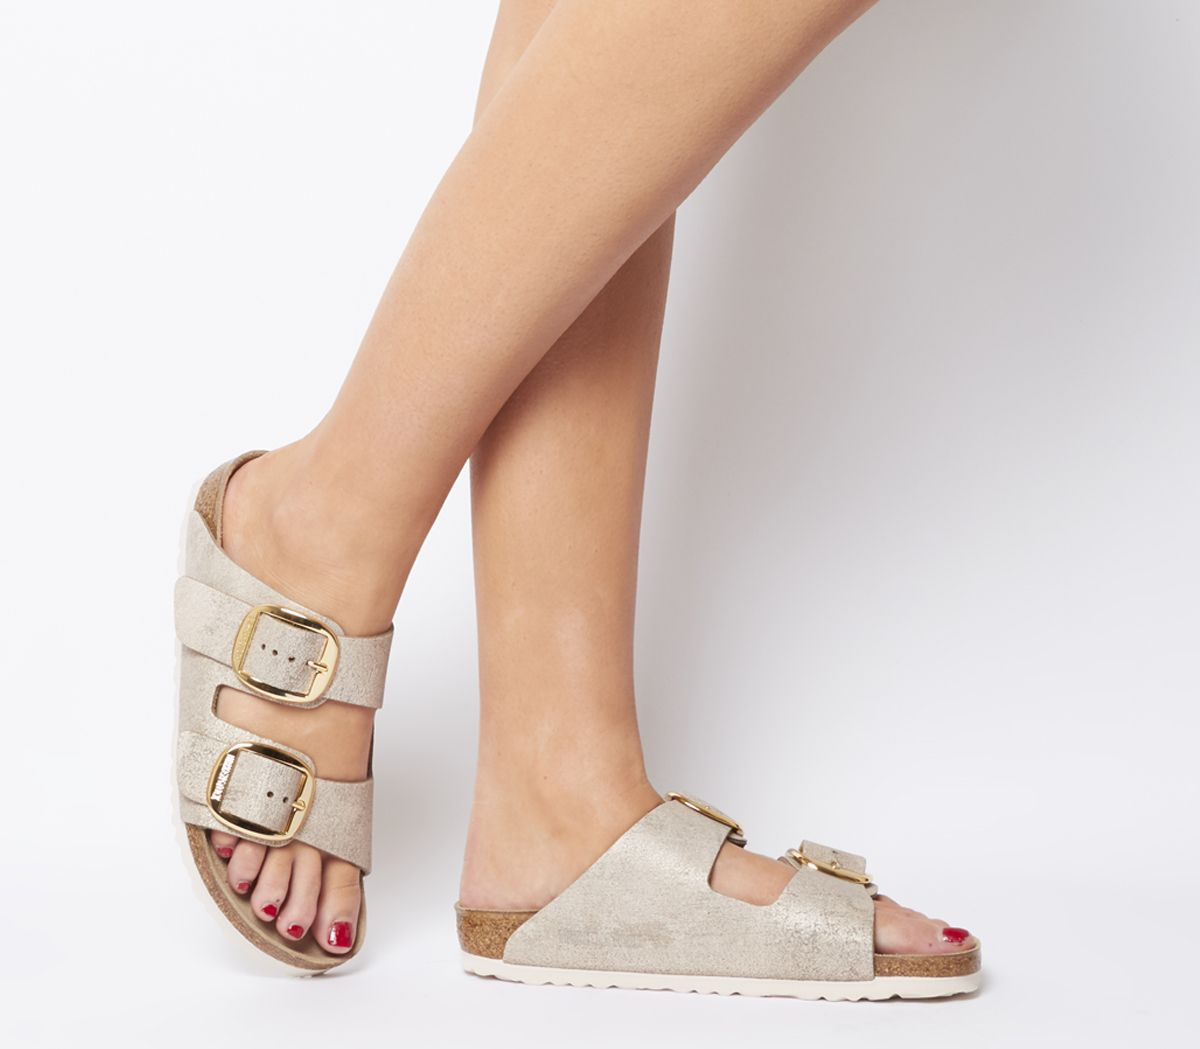 8f4e33a5e939 Birkenstock Arizona Big Buckle Sandals Washed Metallic Rose Gold ...